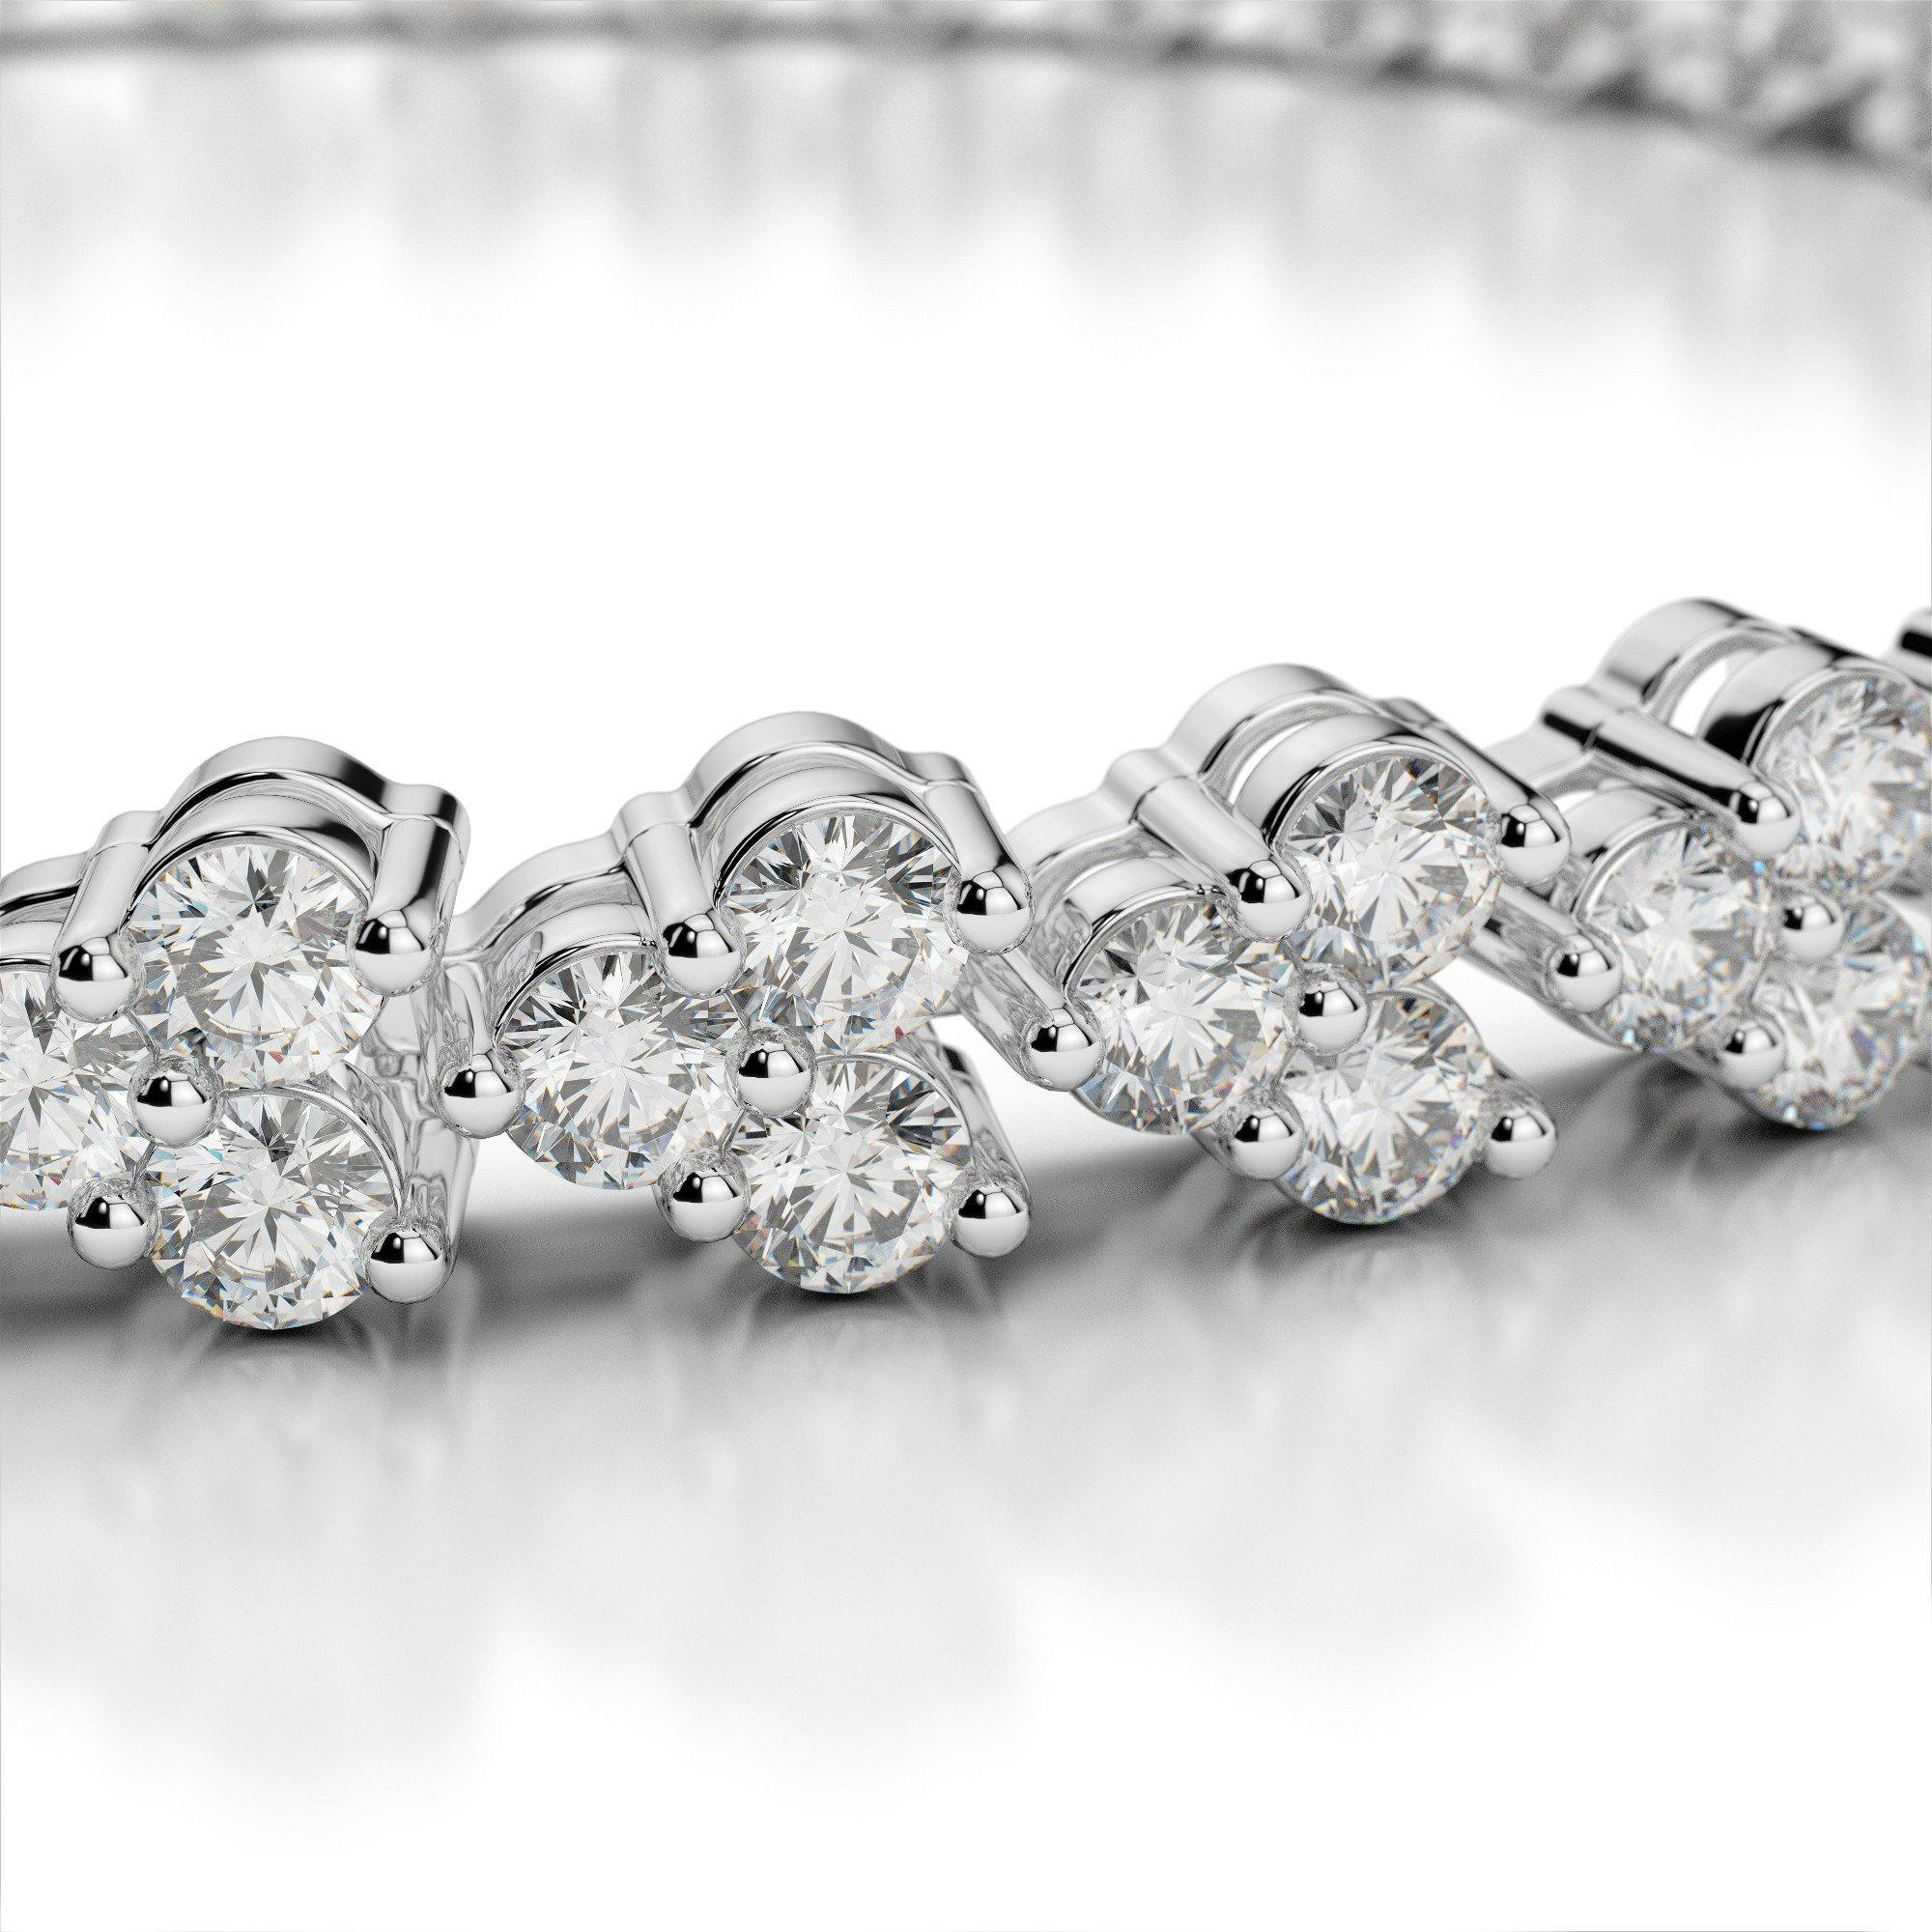 6 Carat Diamond Bracelet